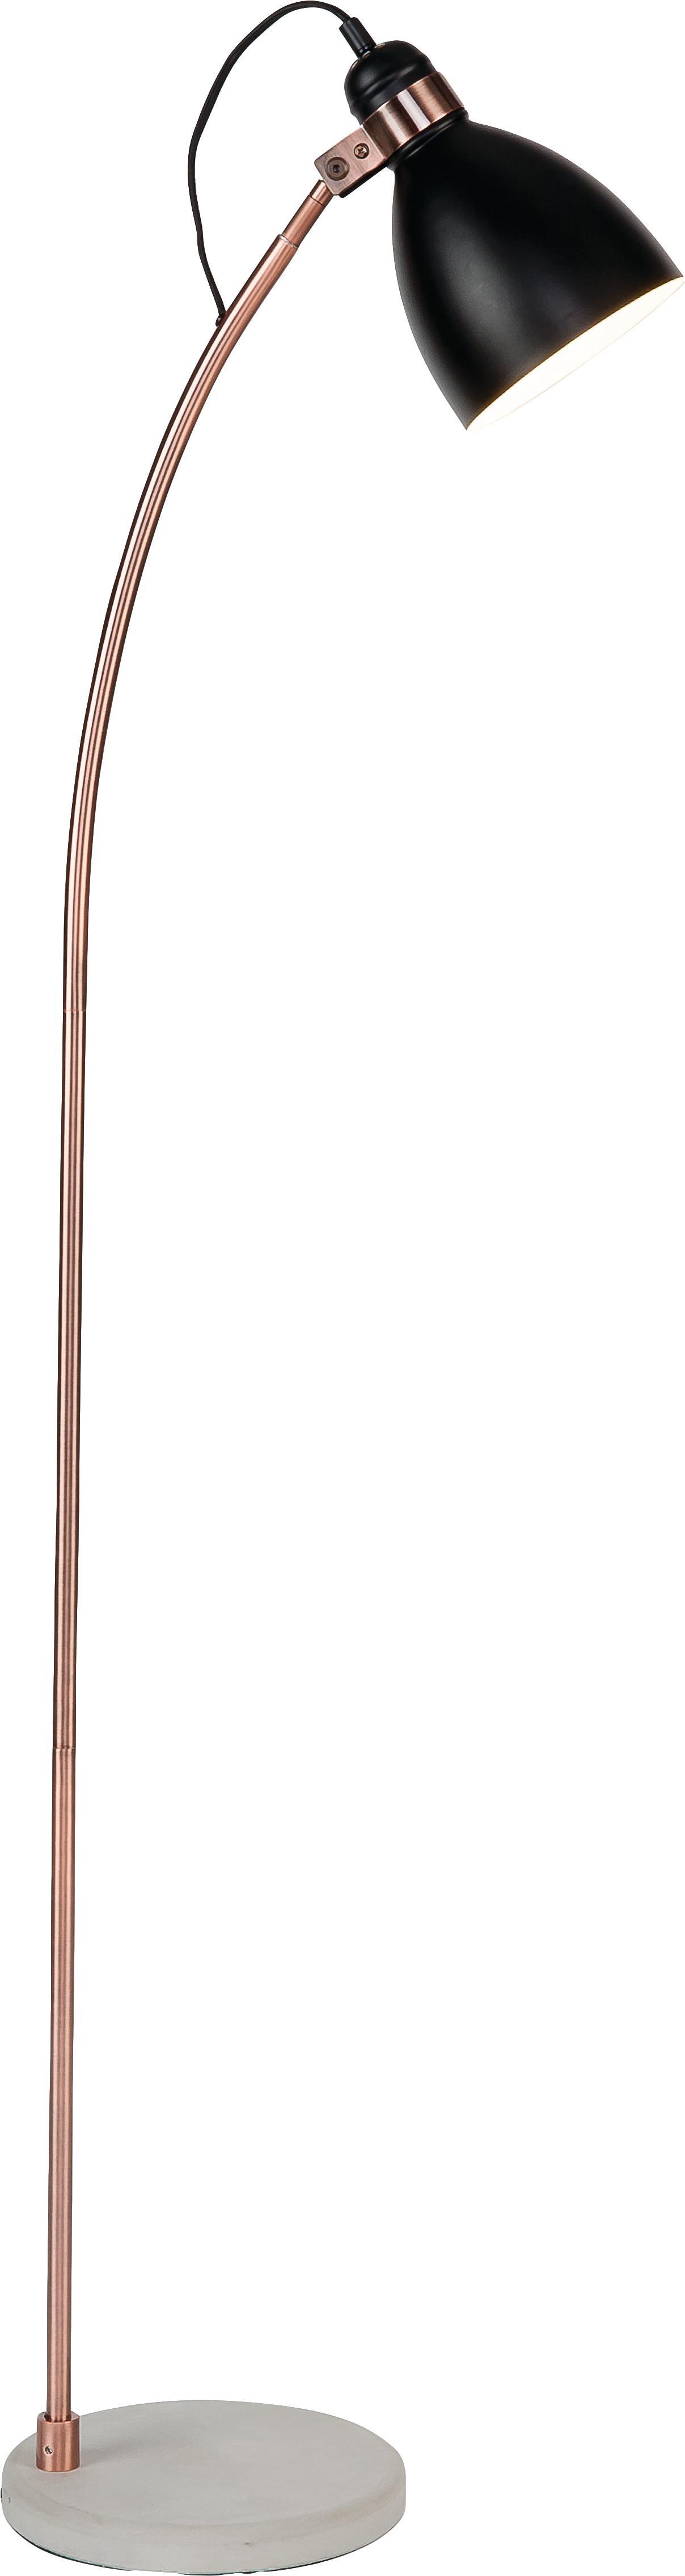 Leselampe Denver mit Betonfuß, Lampenschirm: Eisen, beschichtet, Gestell: Eisen, verkupfert, Lampenfuß: Beton, Lampenschirm: SchwarzStange: KupferLampenfuß: Zement, 37 x 145 cm